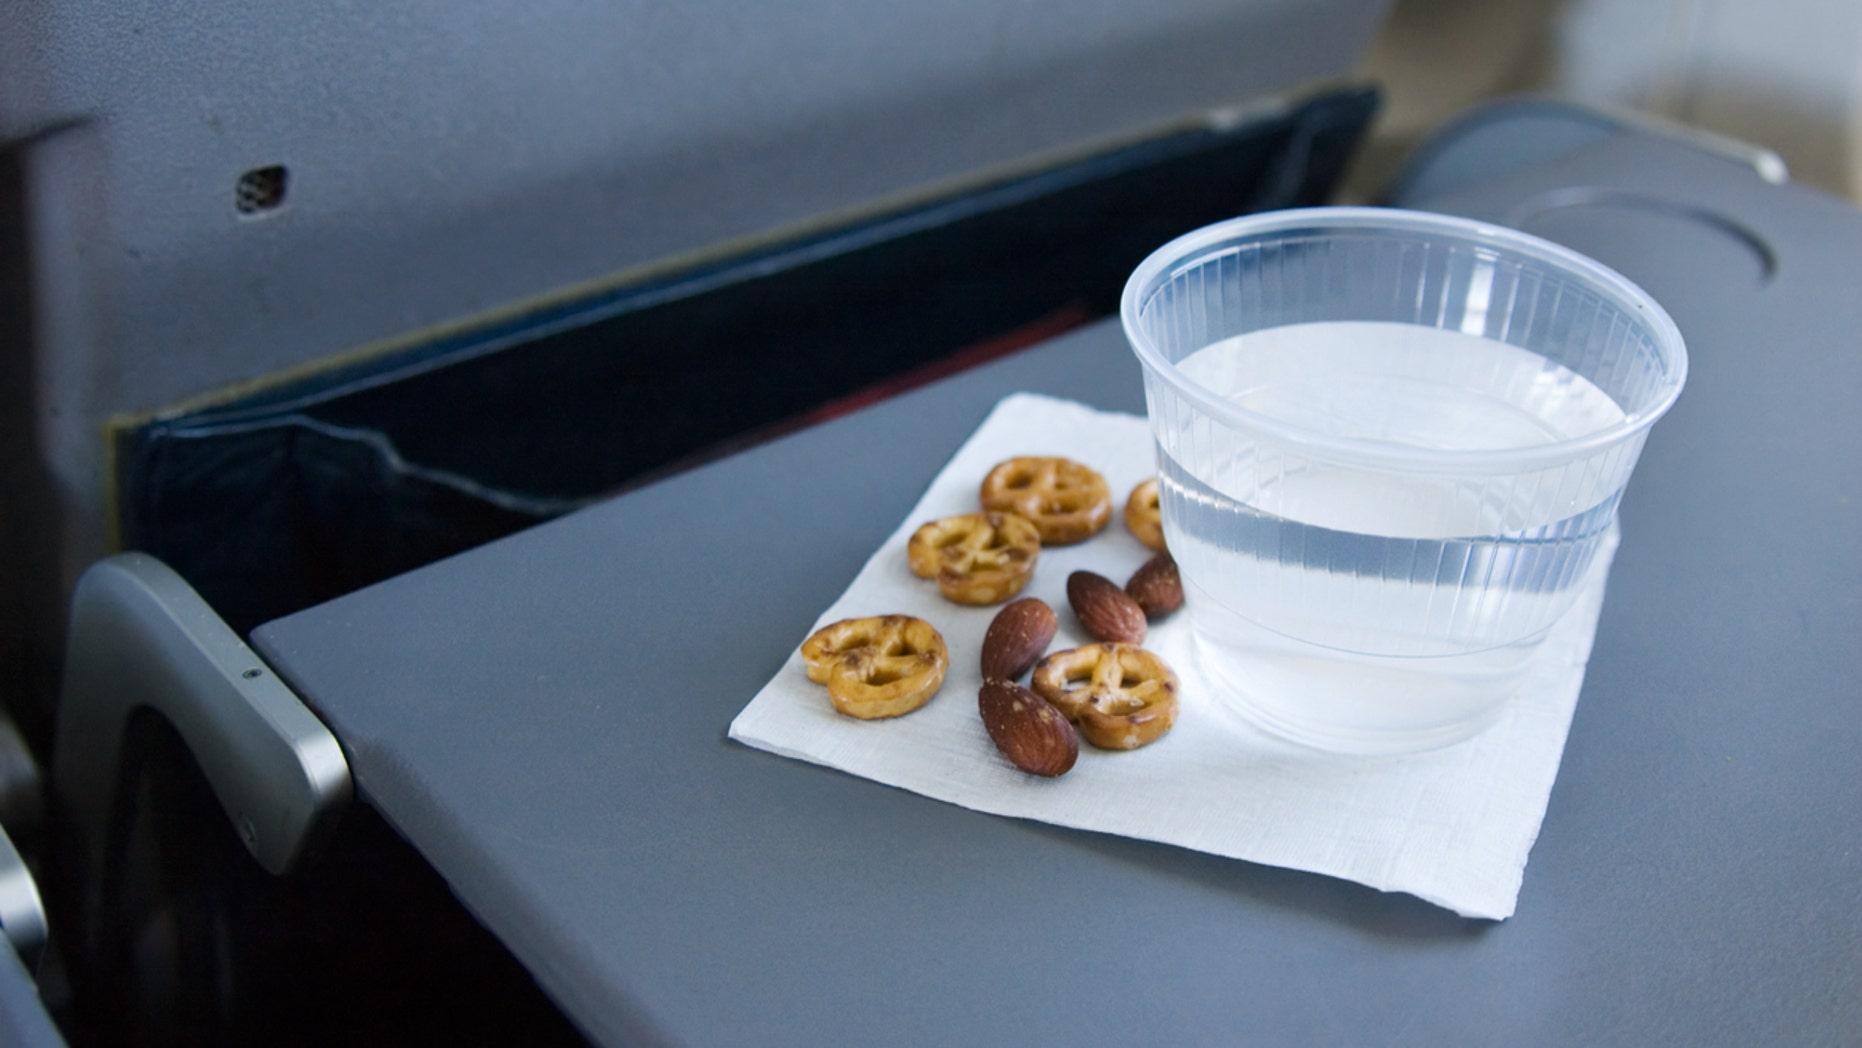 Passenger Recounts Traumatizing Nut Allergy From Flight